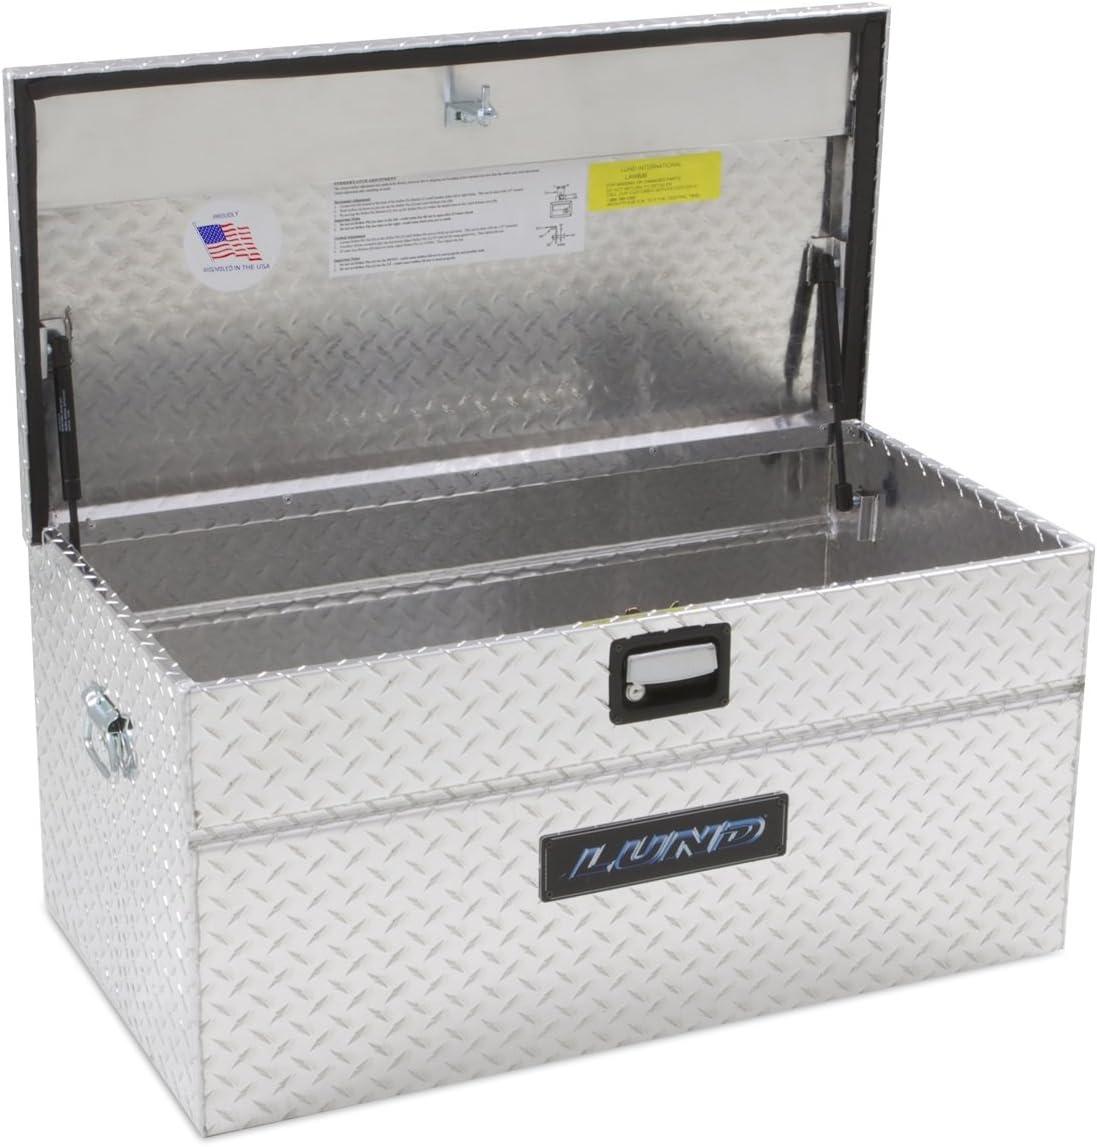 Lund 9436T 36-Inch Aluminum Flush Mount Single Lid Truck Tool Box, Diamond Plated, Silver